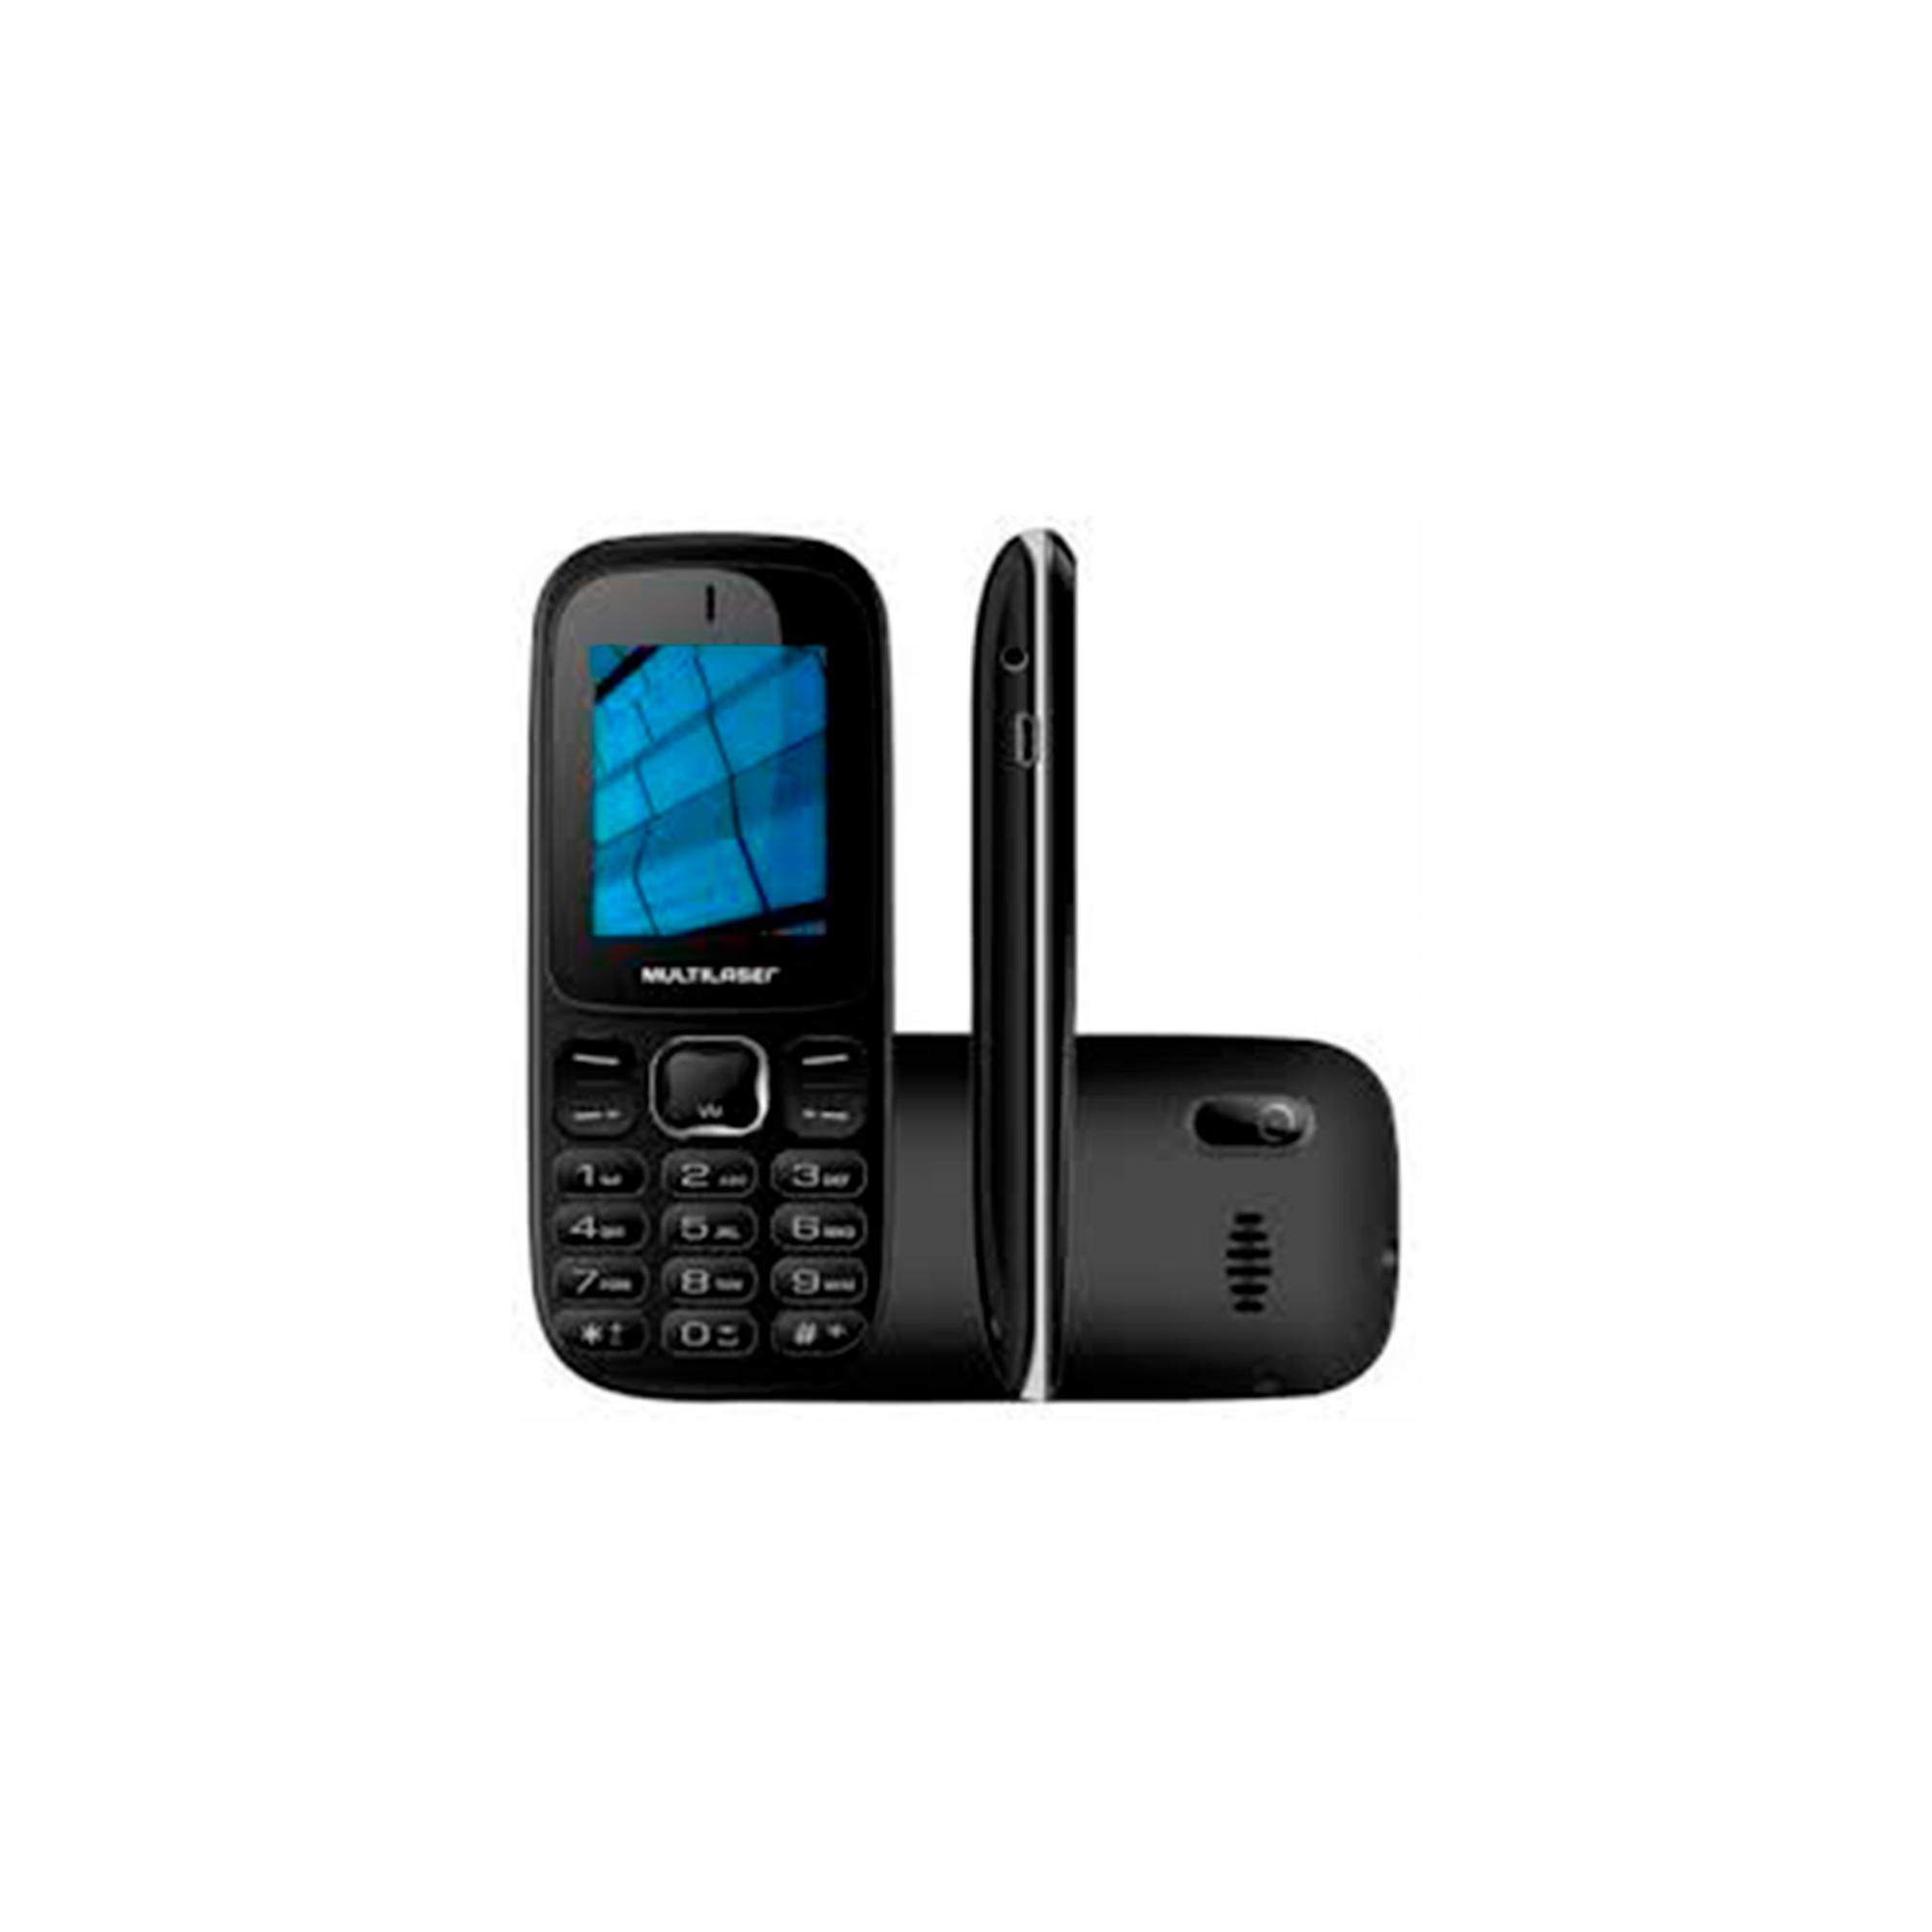 MULTILASER P9017 UP DUAL 3G PRETO MM